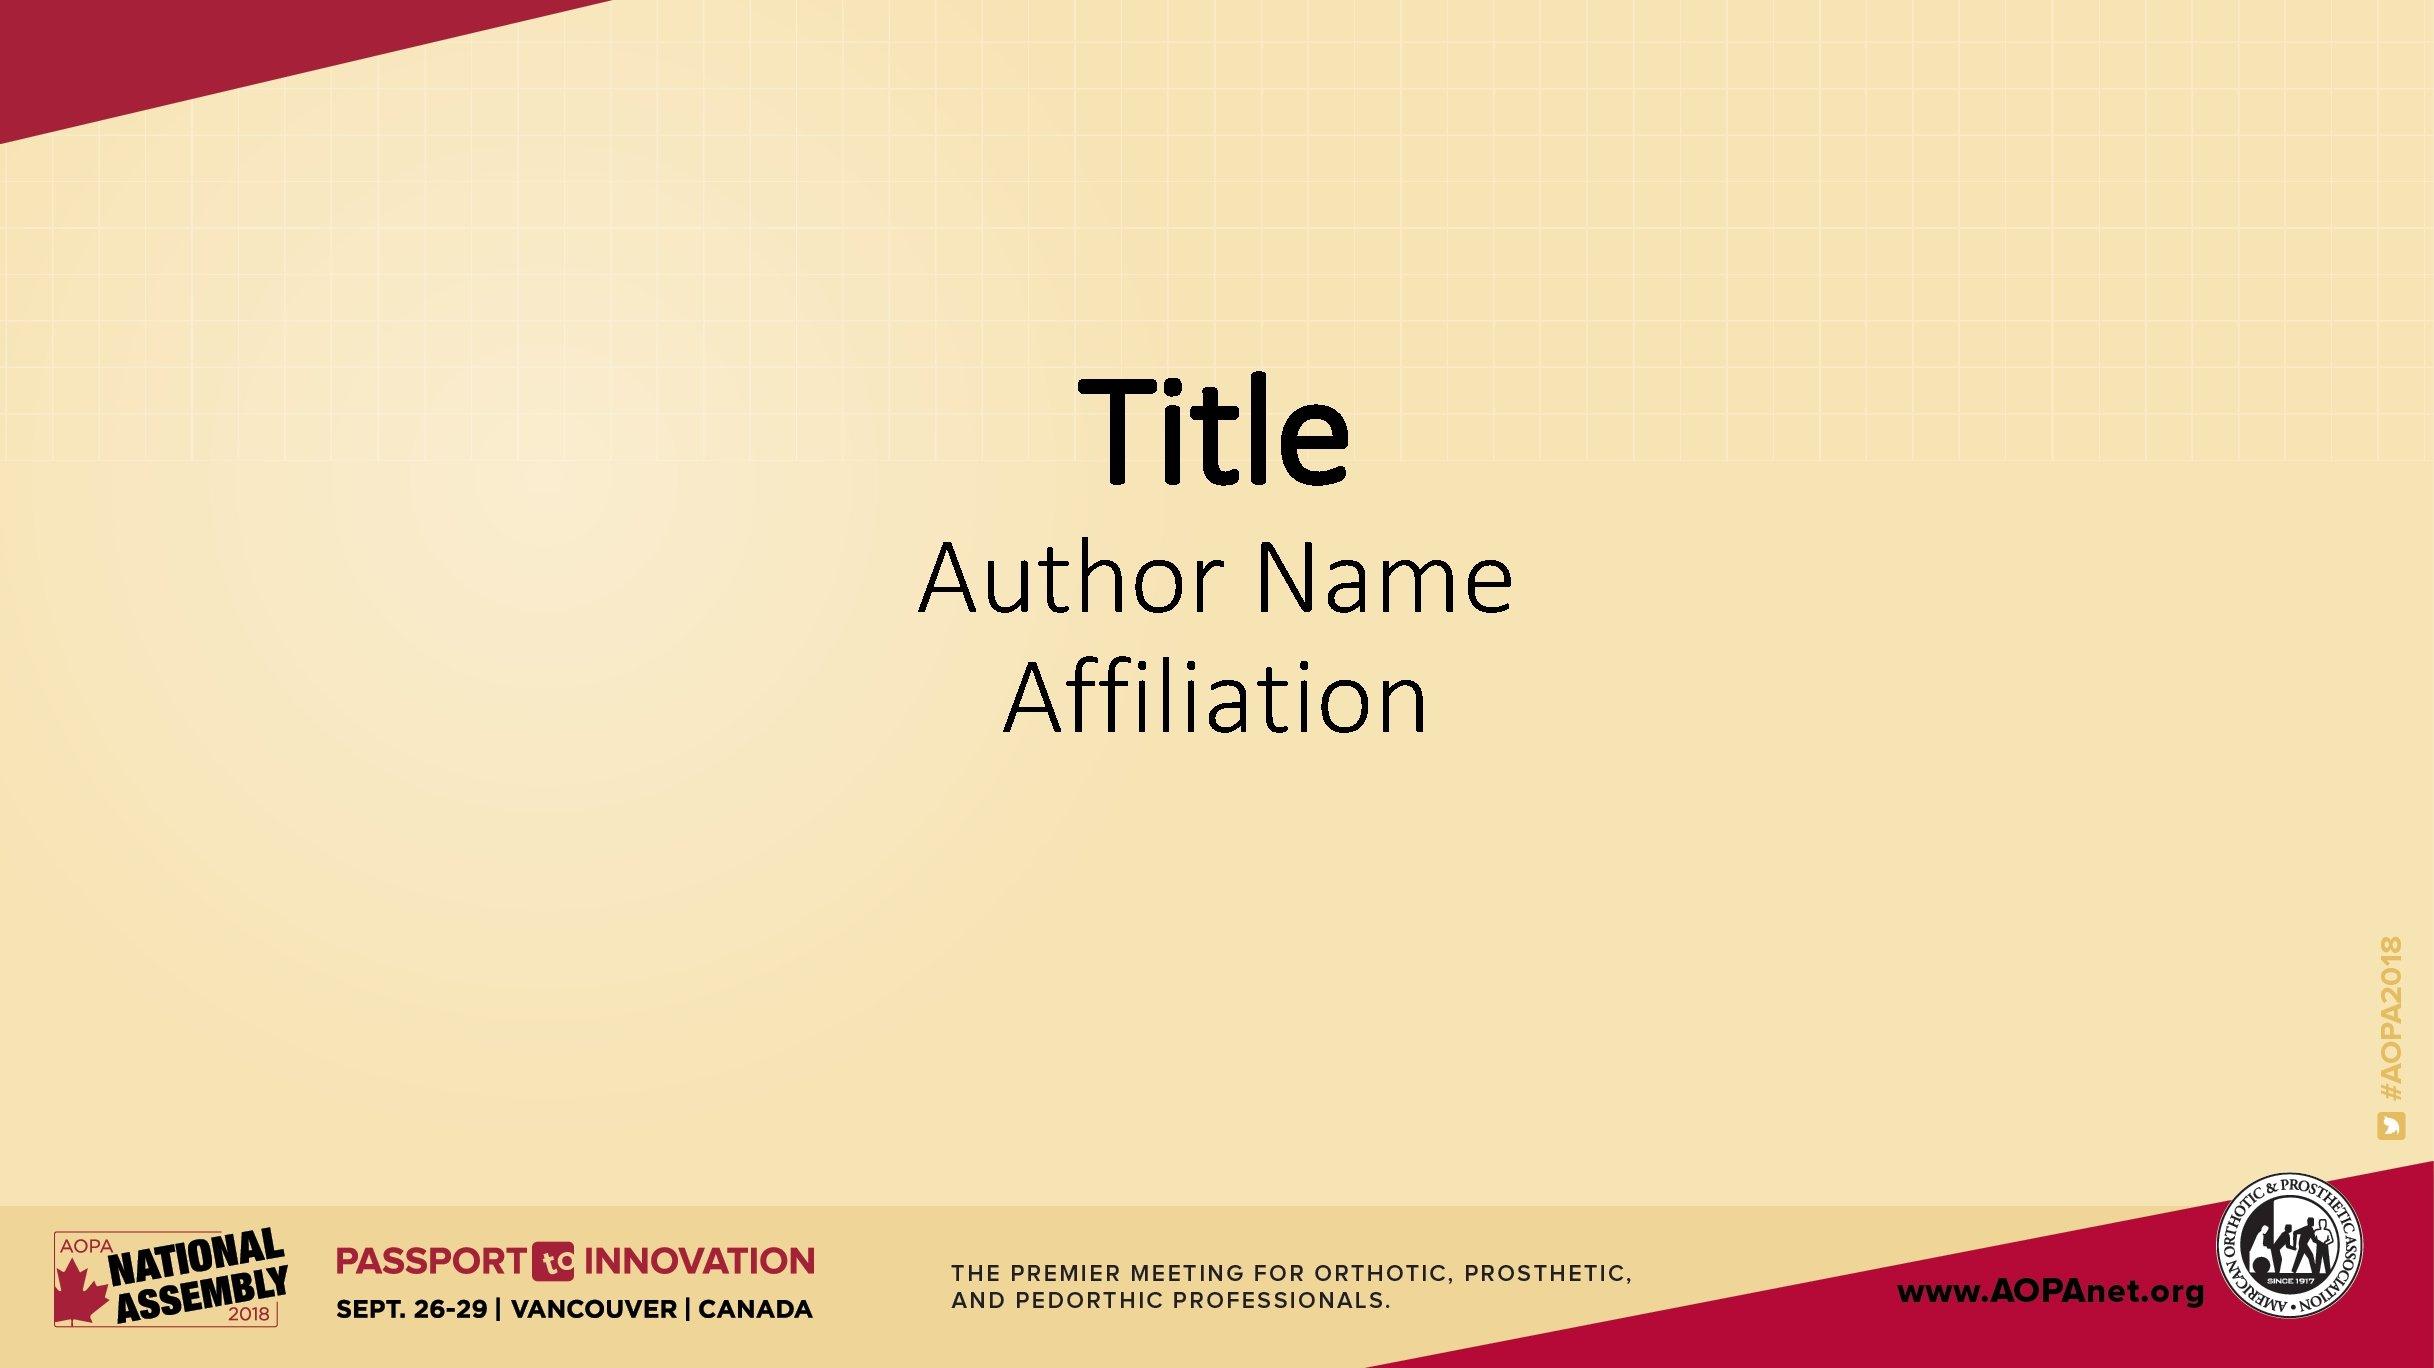 Title Author Name Affiliation